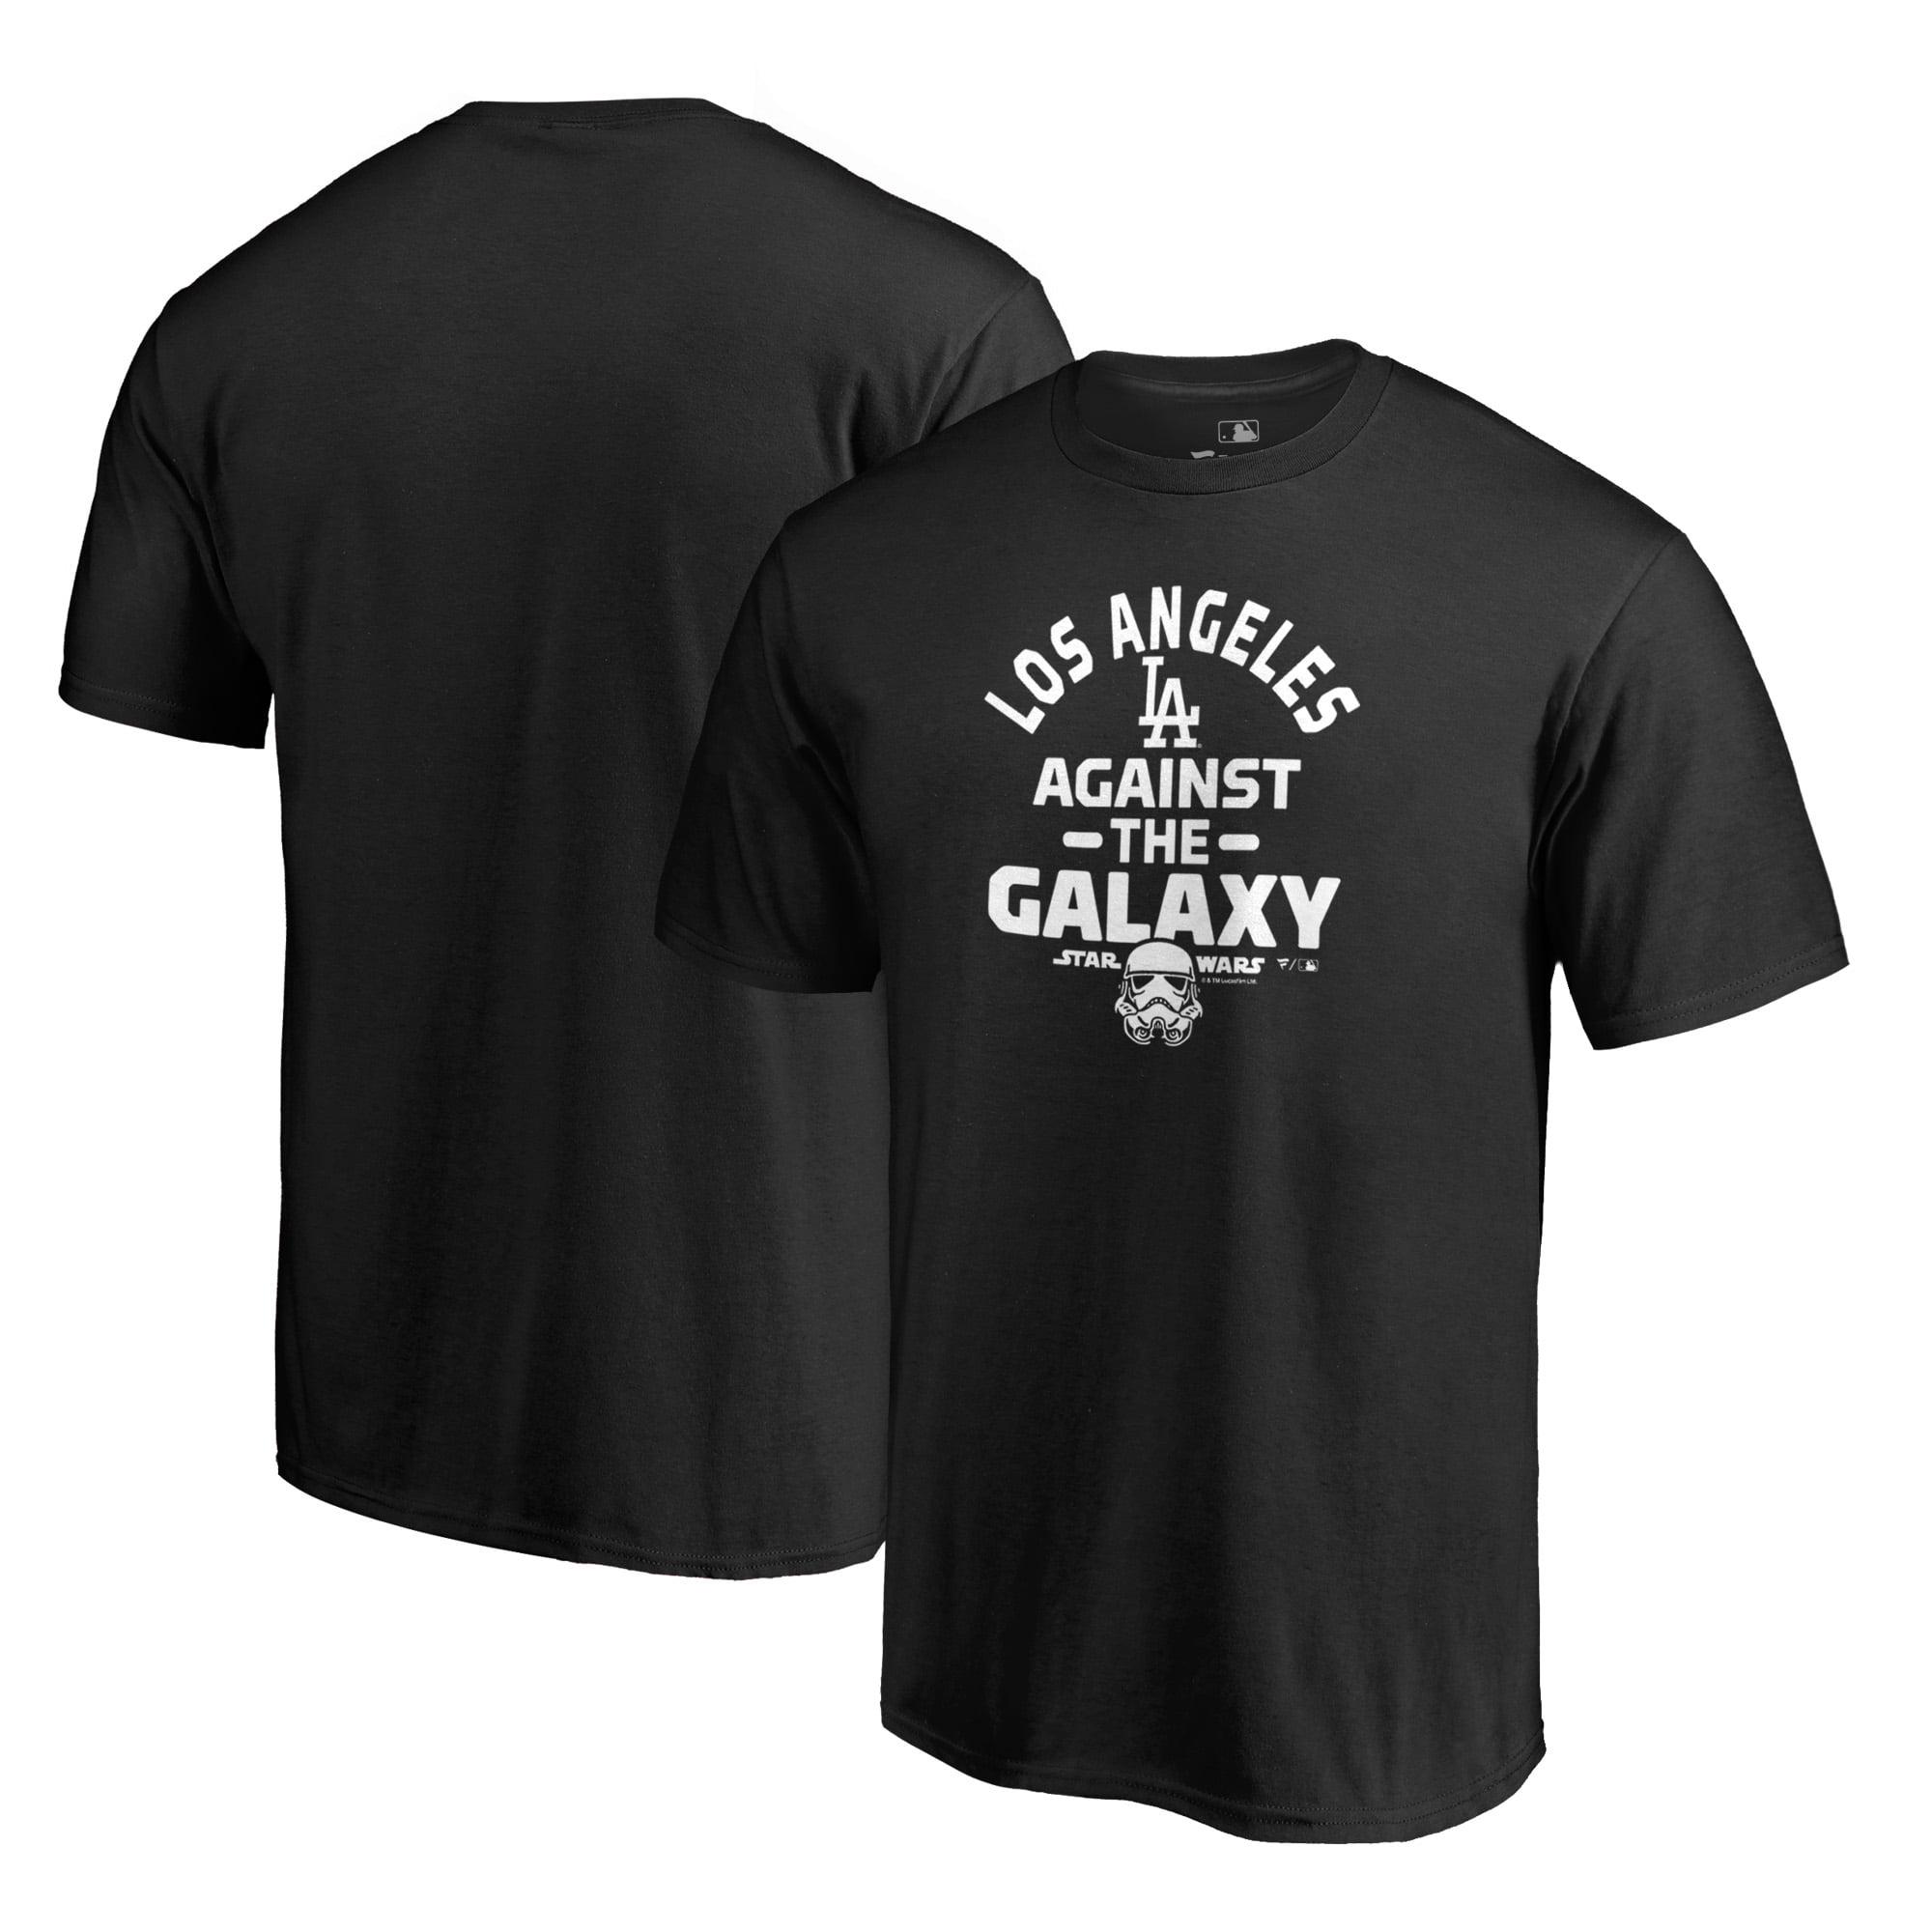 Los Angeles Dodgers Fanatics Branded MLB Star Wars Against The Galaxy T-Shirt - Black